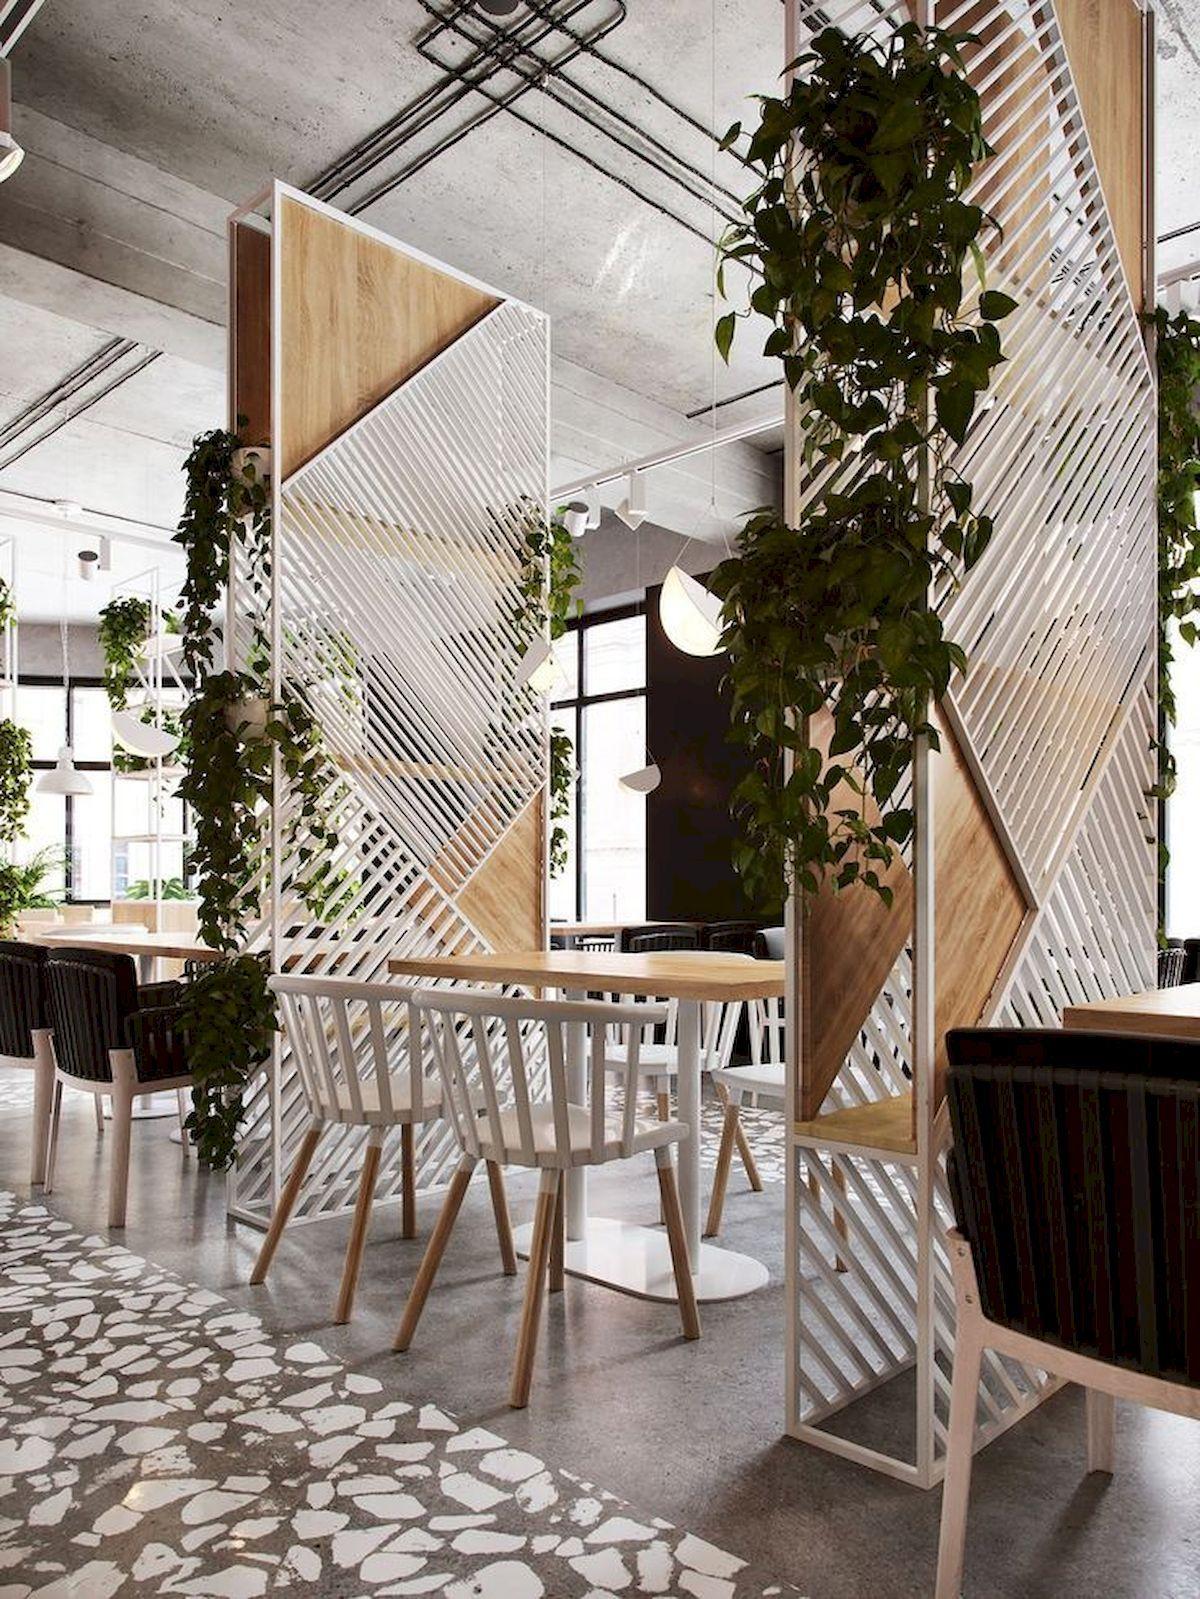 Deco restaurant interior design cafe diy room dividers also chalkboard key rack bloggers  best ideas pinterest rh